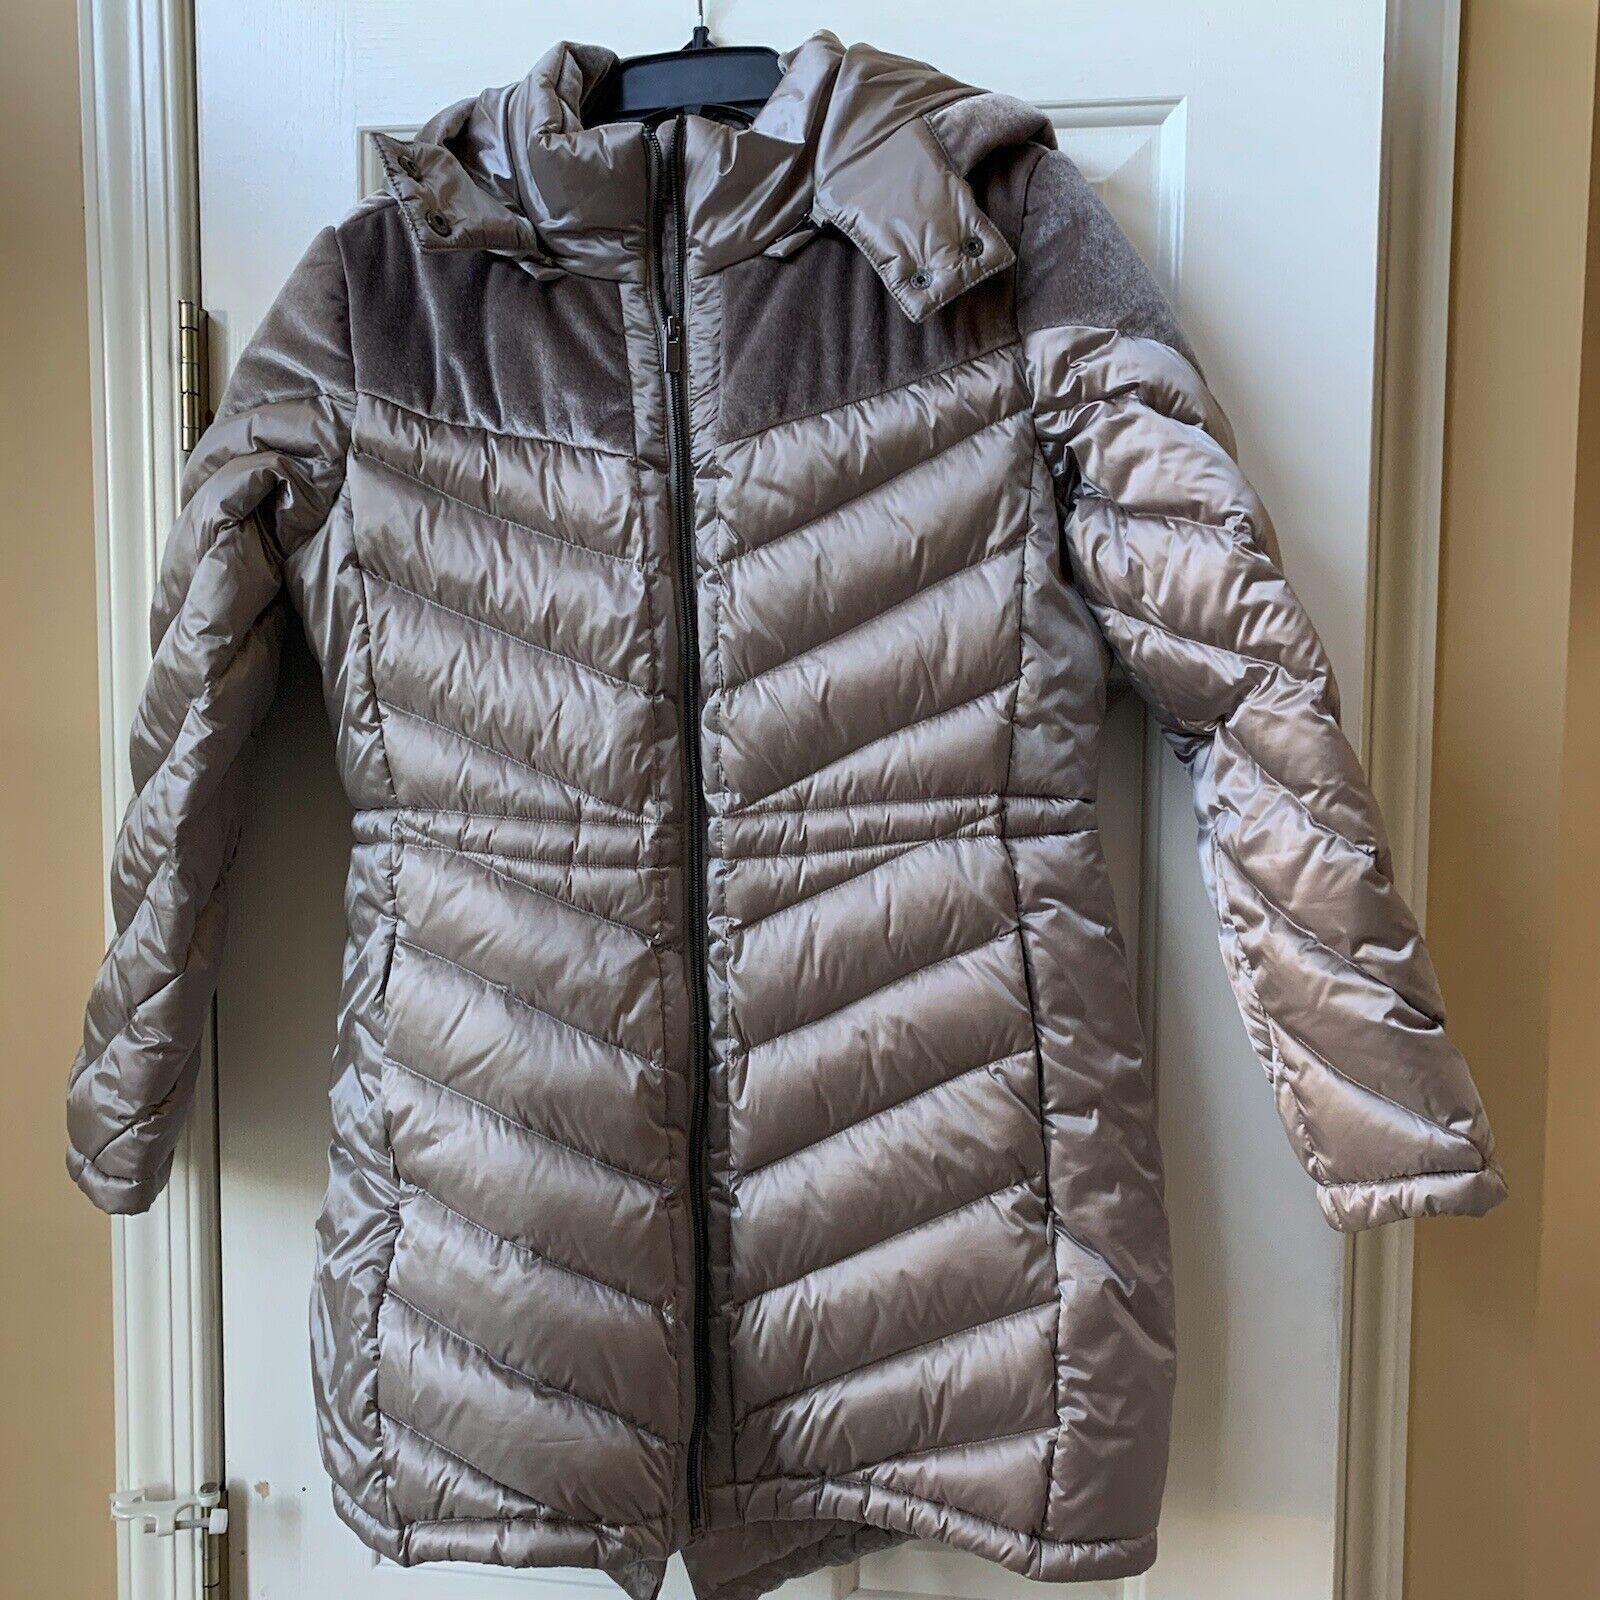 Belle Badgley Mischka Down Light weight Packable Jacket Coat Size Large NWOT